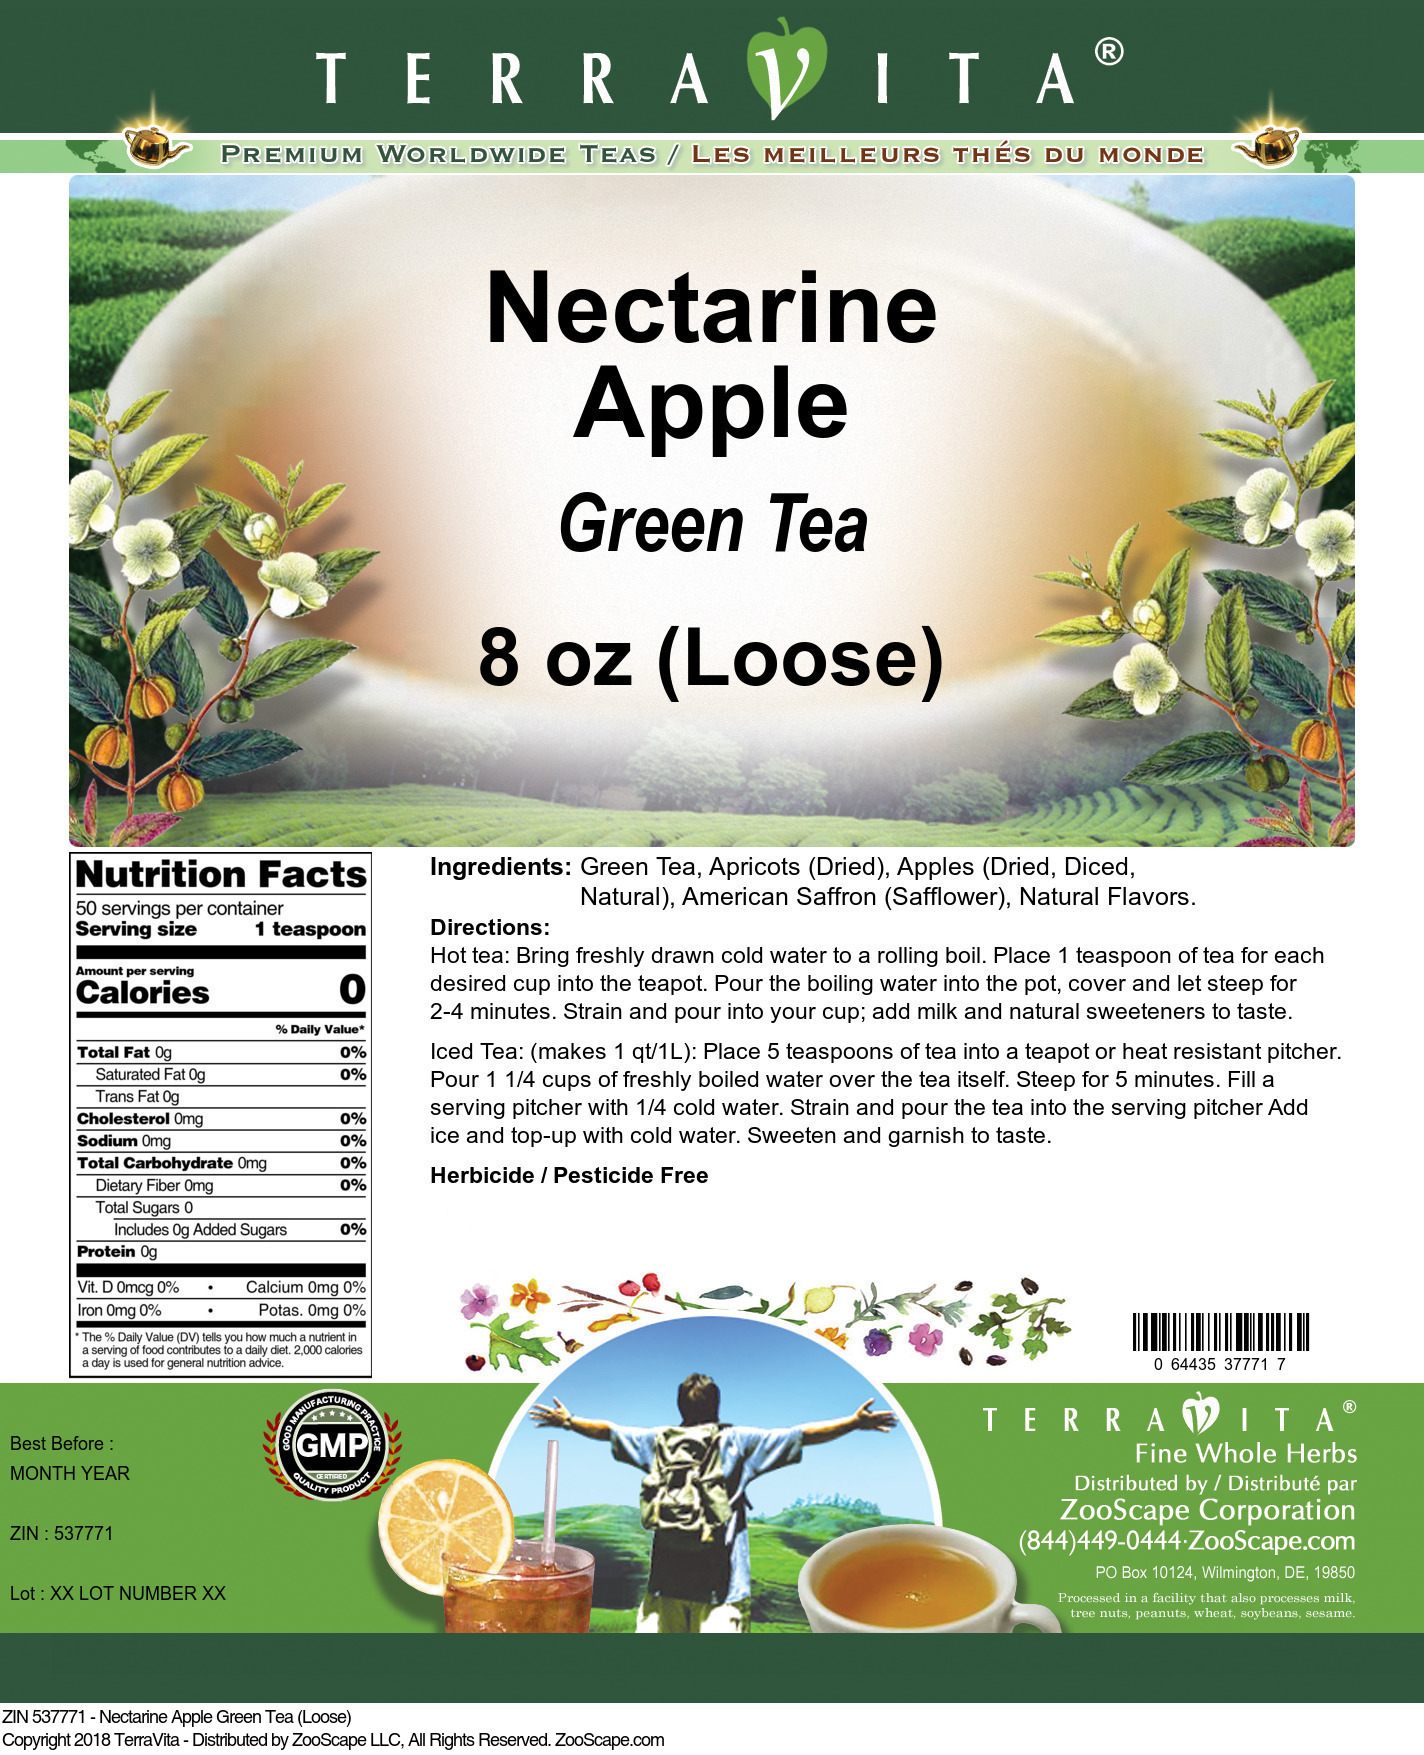 Nectarine Apple Green Tea (Loose)